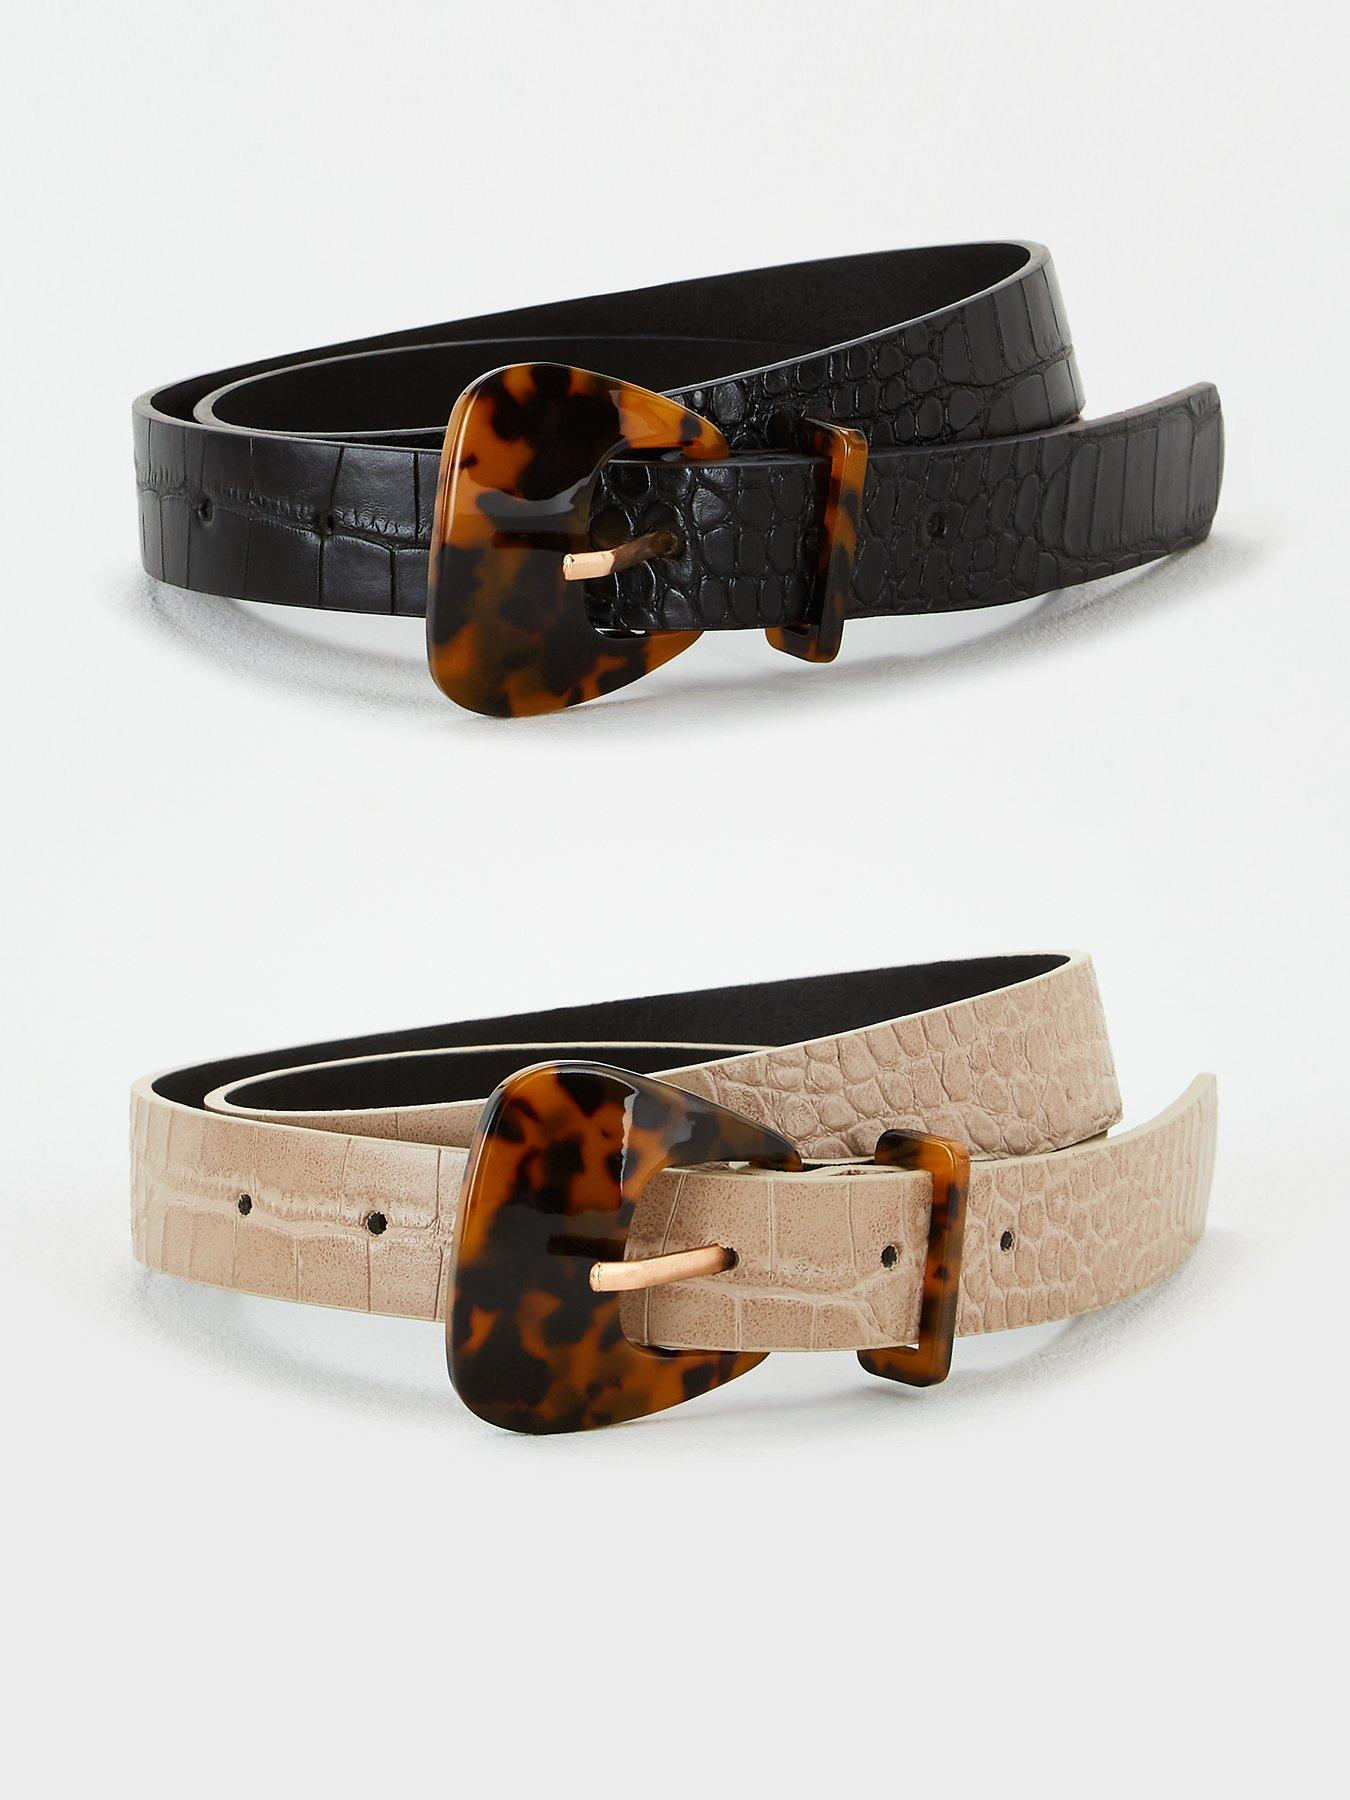 Womens Belts | Shop Womens Belts at Very.co.uk